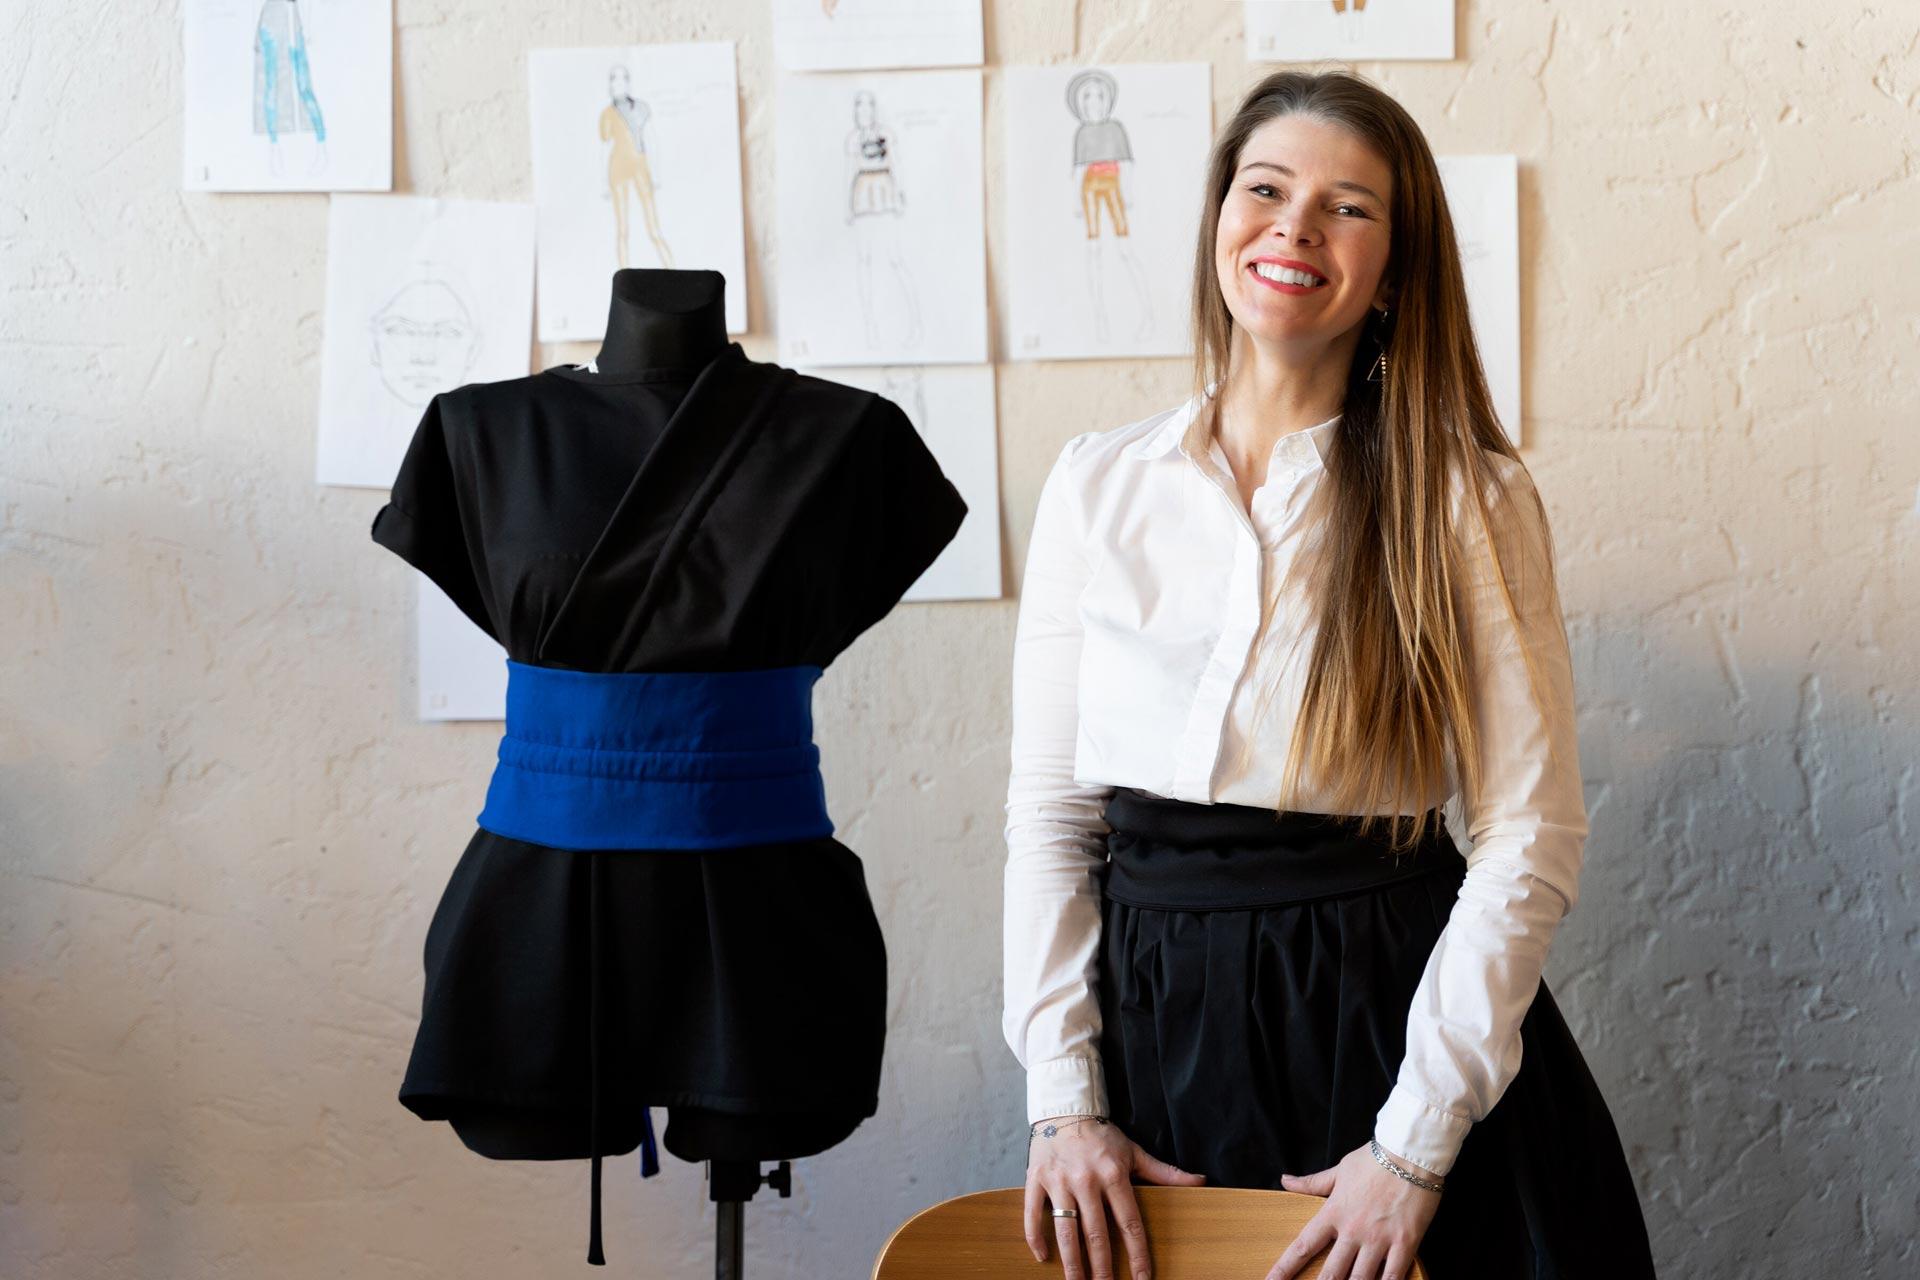 История успеха: Шуклина Тамара, основатель бренда одежды TOMMYDI